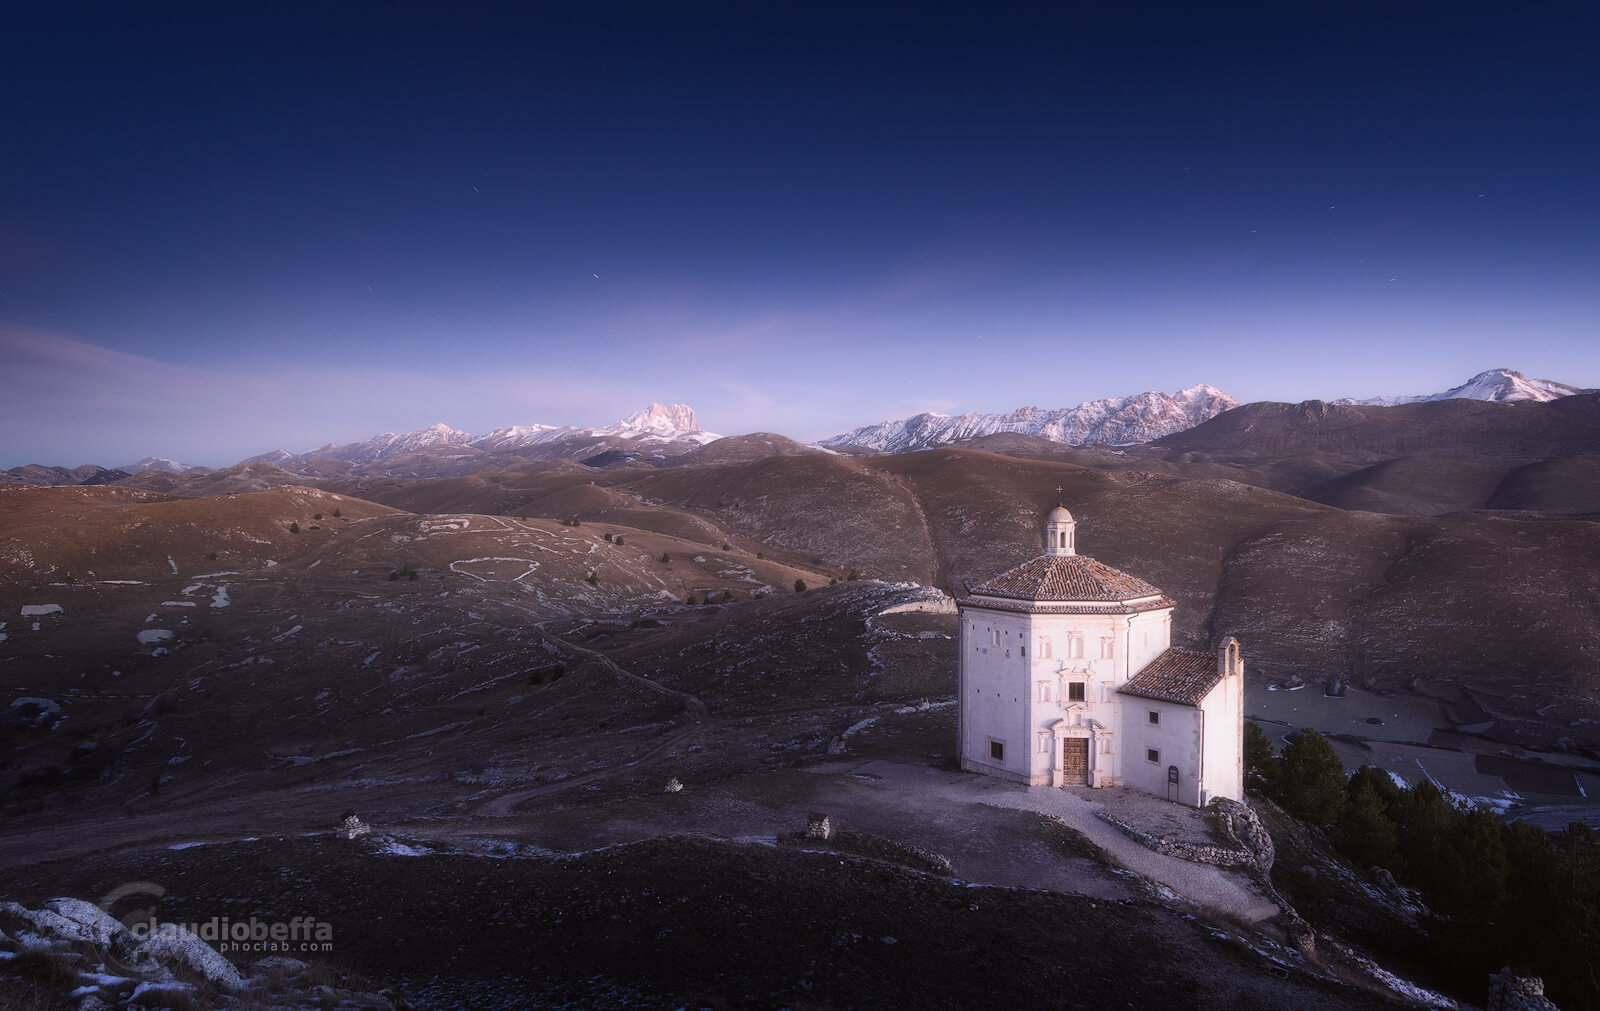 Winter silence, Rocca Calascio, Abruzzo, fortress, stronghold, italy, landscape, mountains, apennines, winter, sunrise, dawn